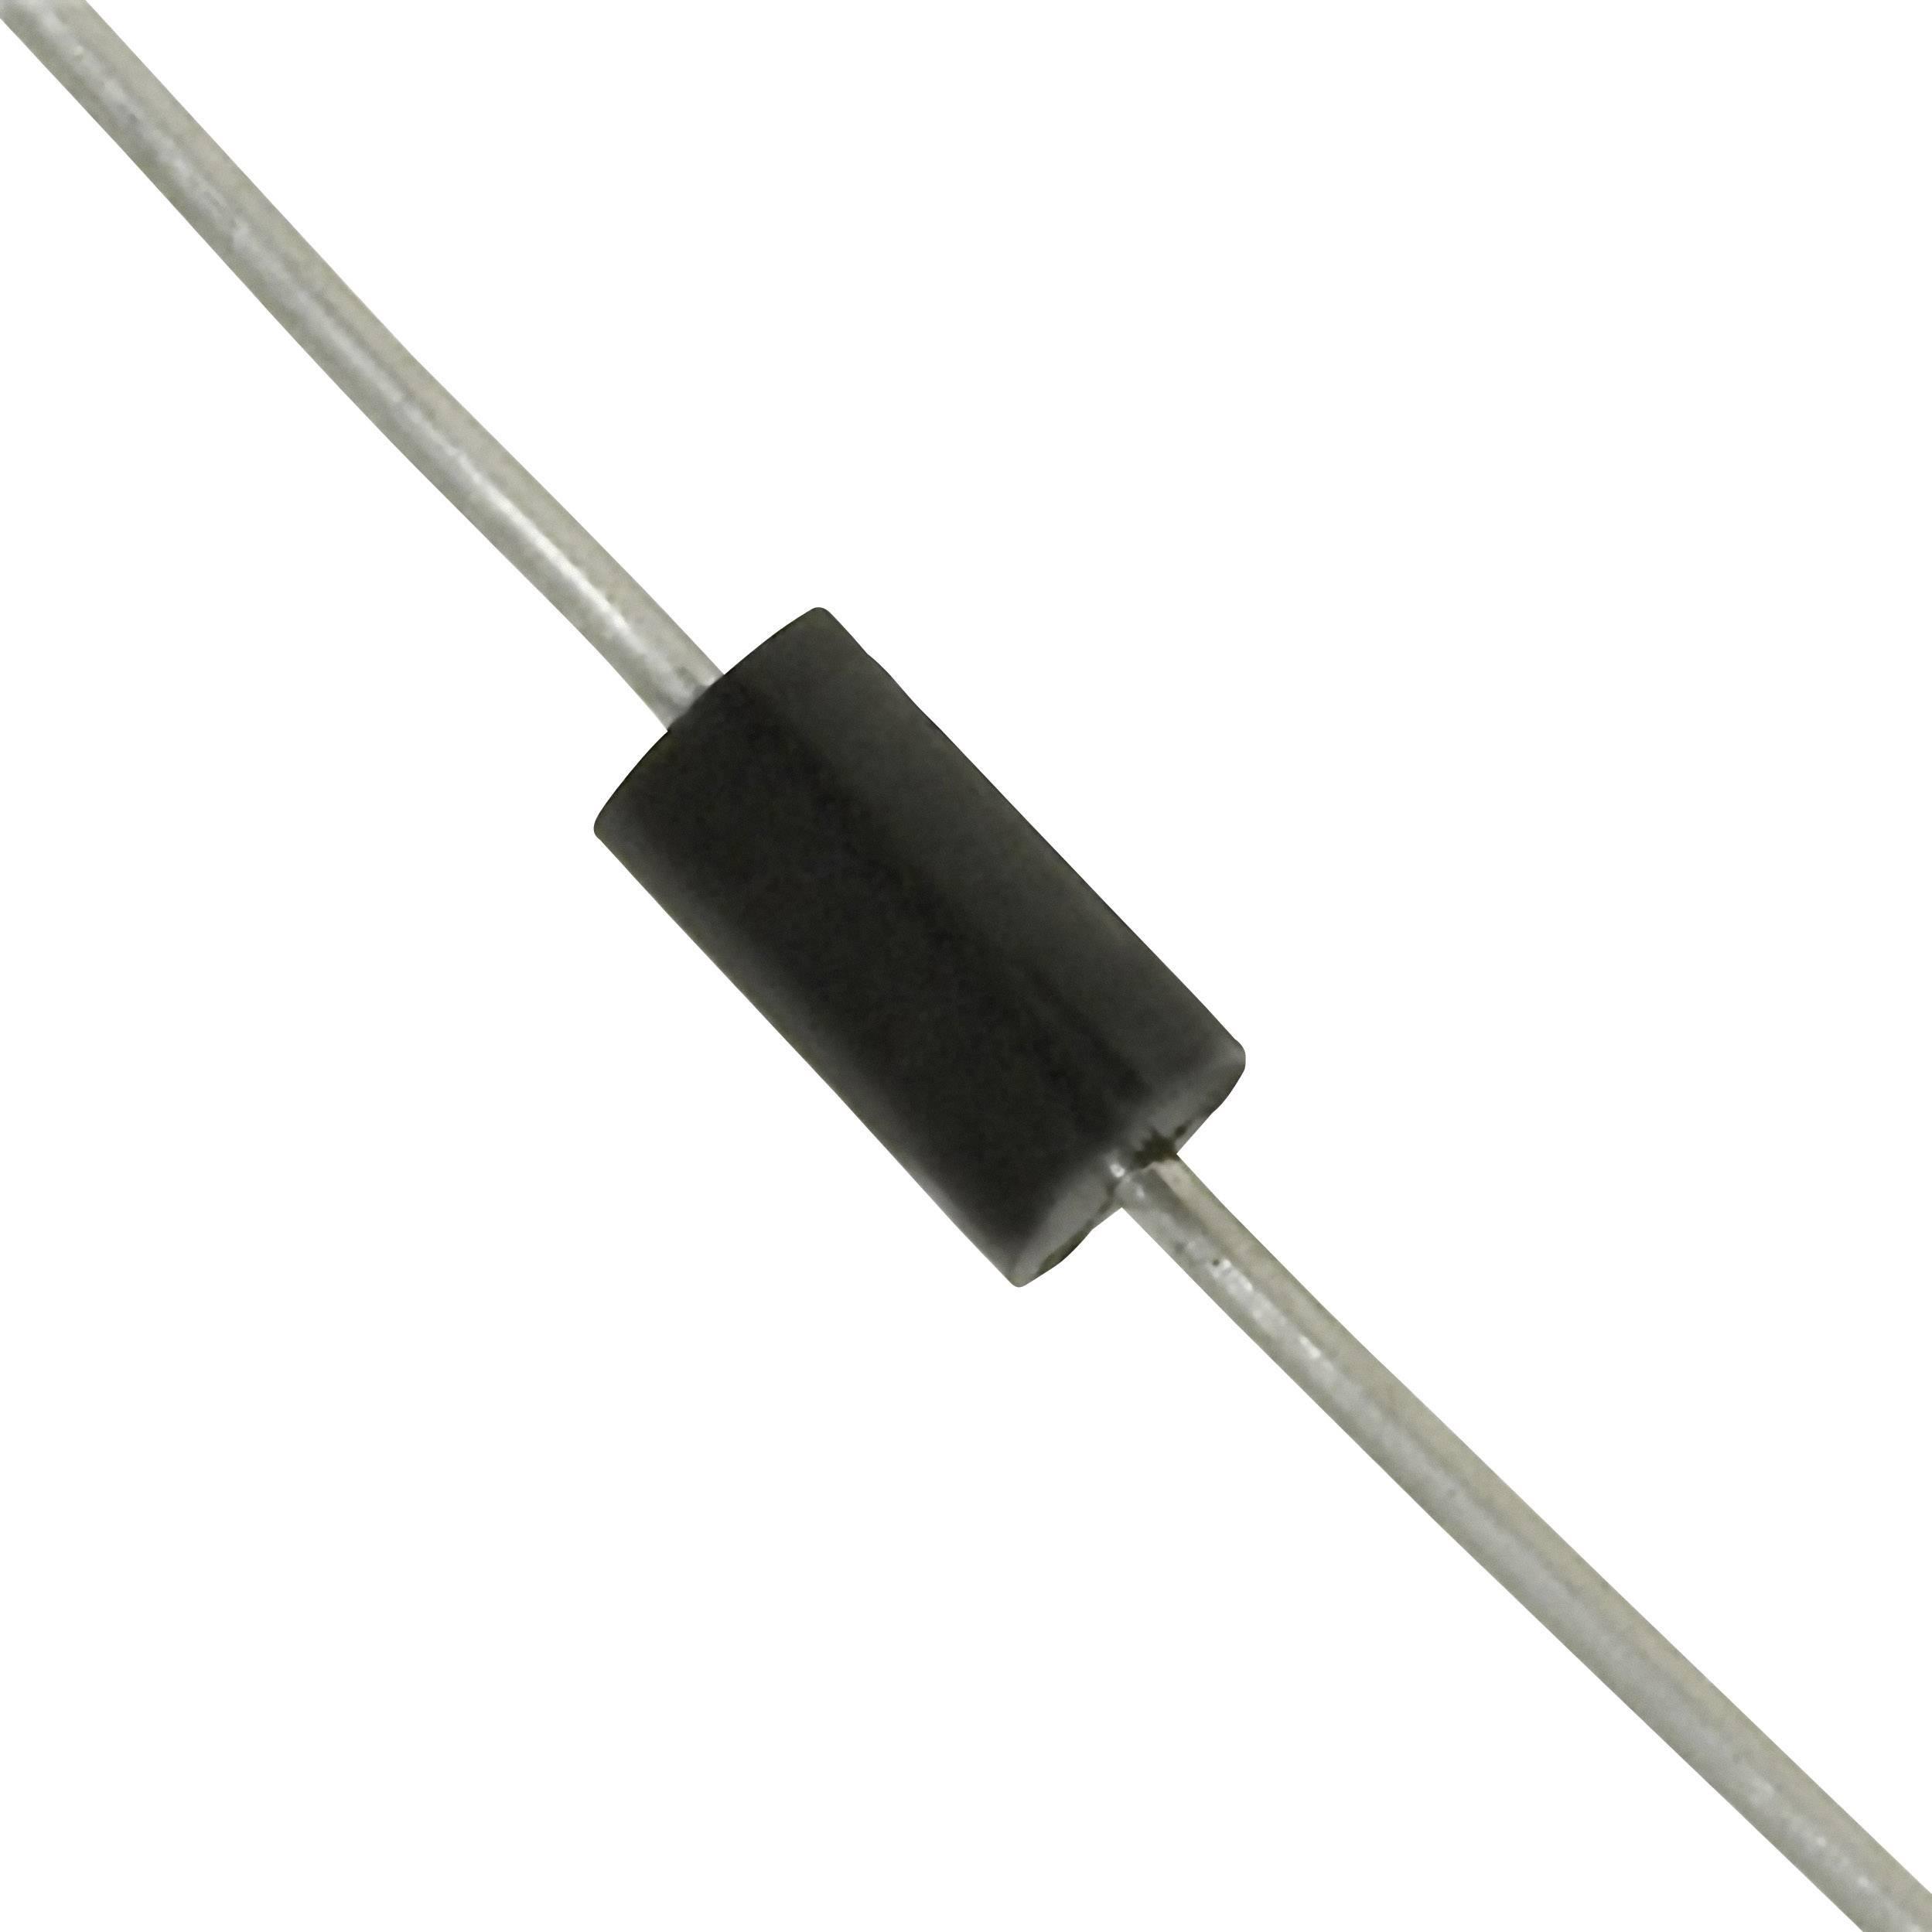 TVS dioda Littelfuse P6KE15CA, U(Db) 14.3 V, I(PP) 28.8 A